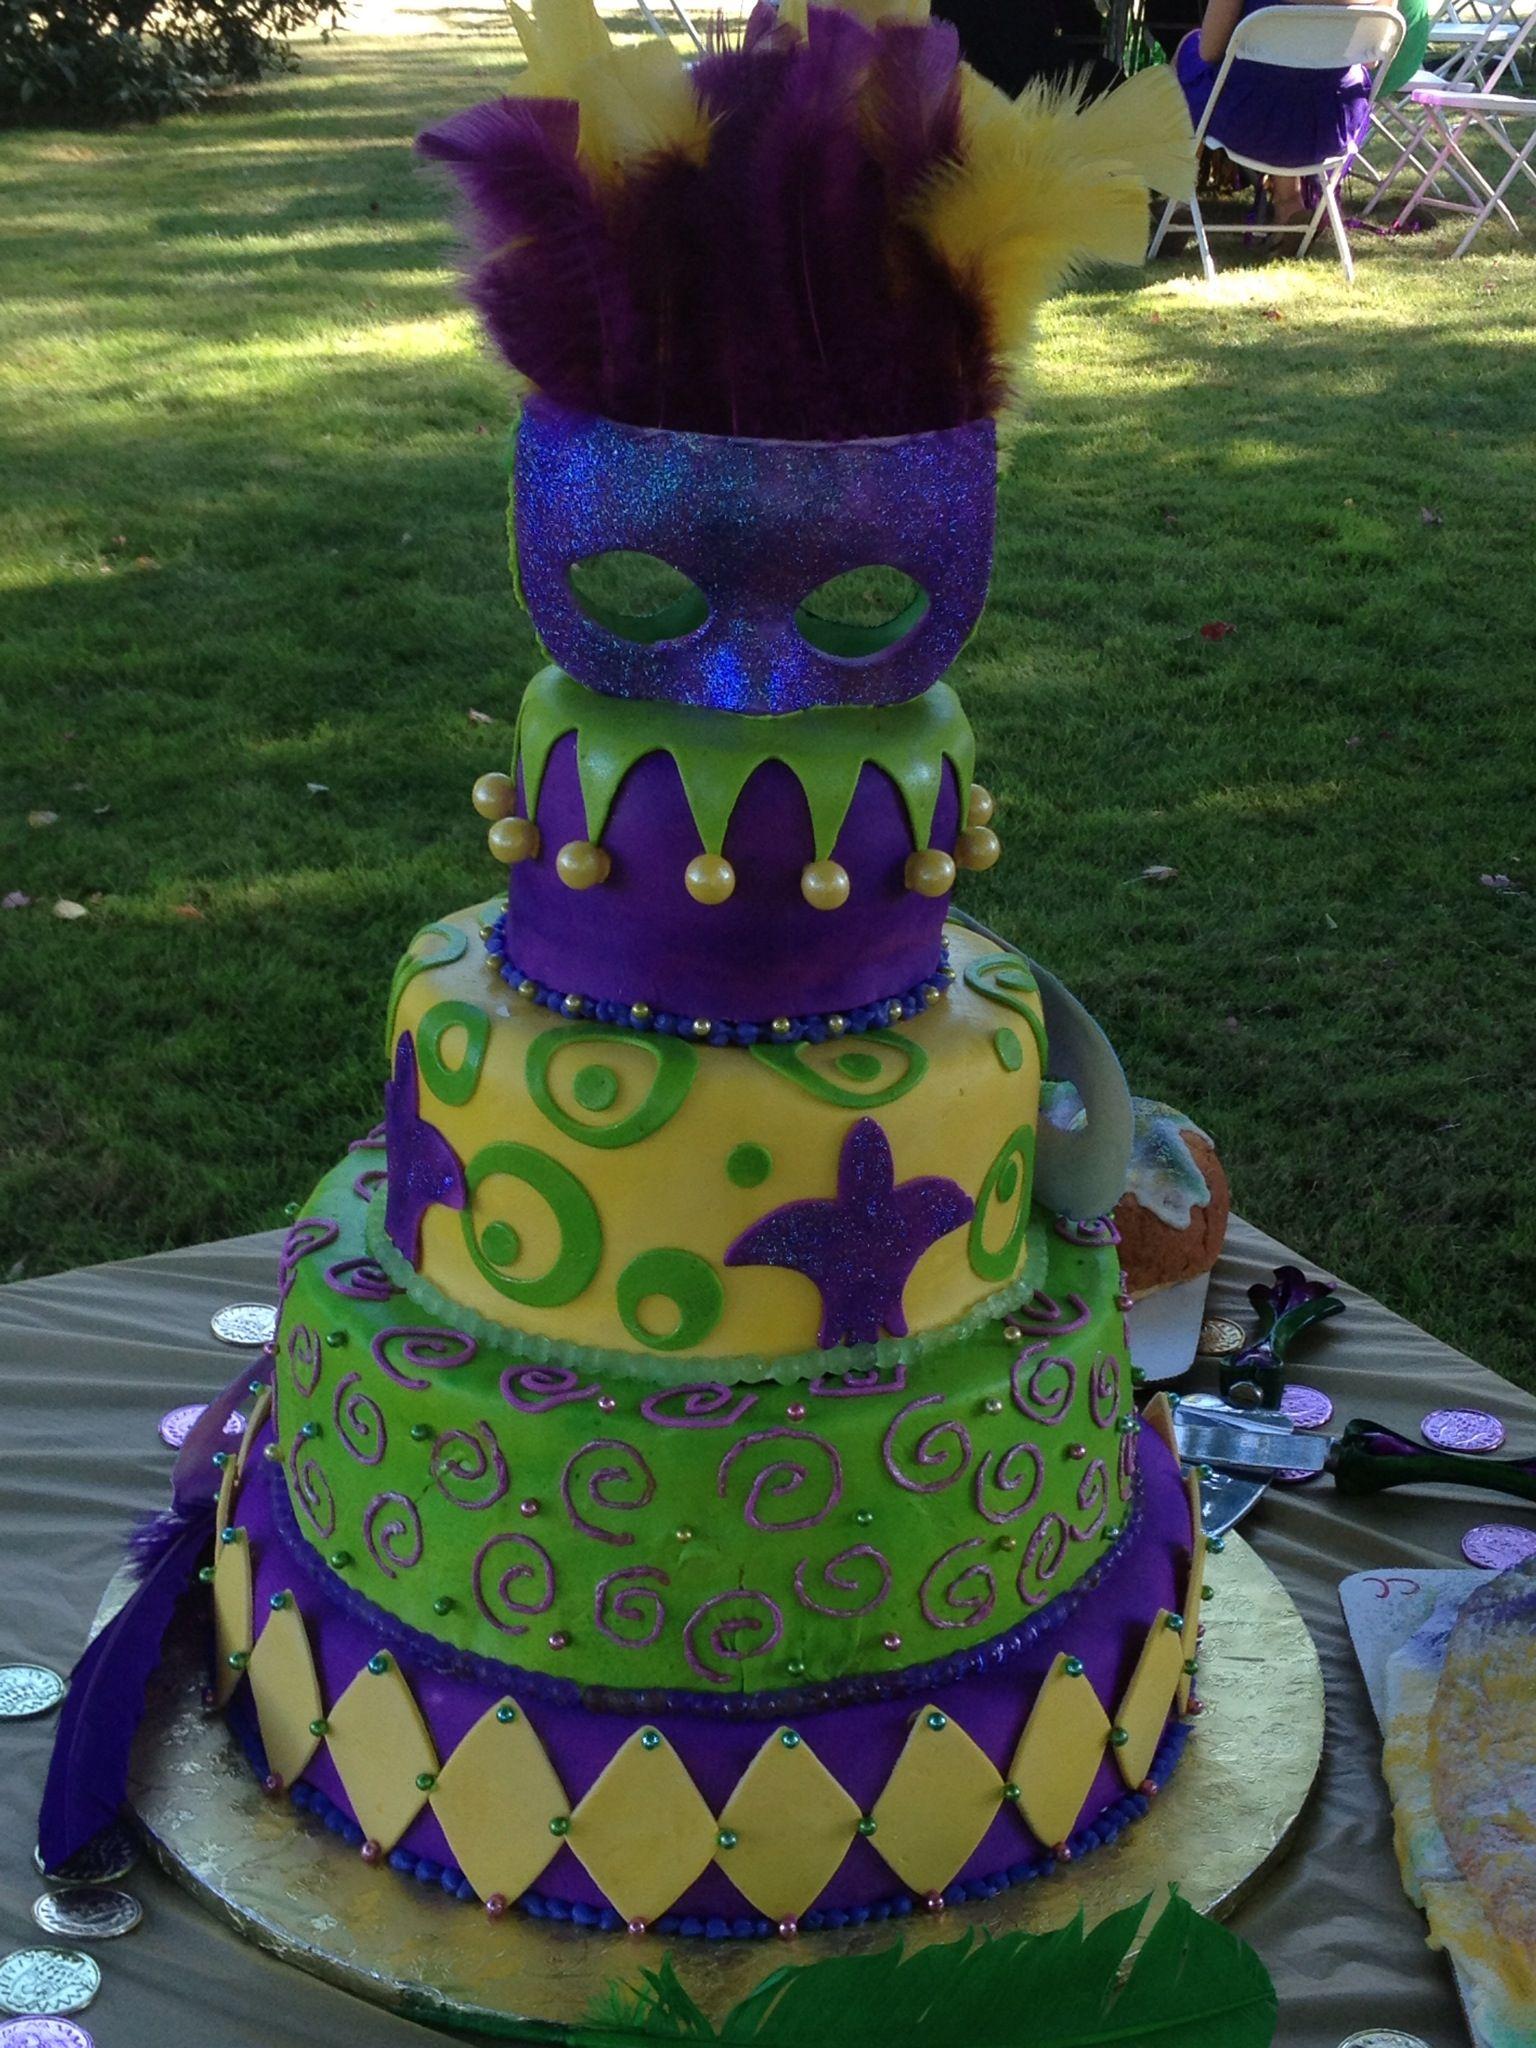 My Mardi Gras wedding cake | Kimmi\'s Cakes | Pinterest | Mardi gras ...